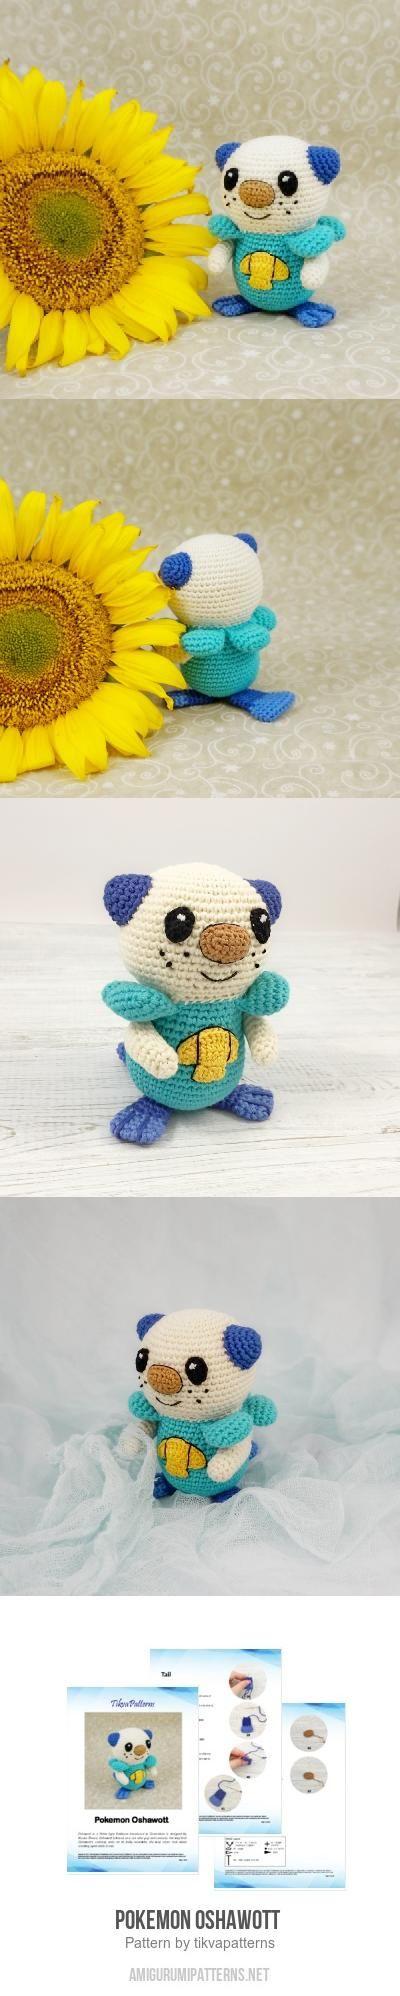 440 best Pokémon crochet images on Pinterest | Crochet patterns ...